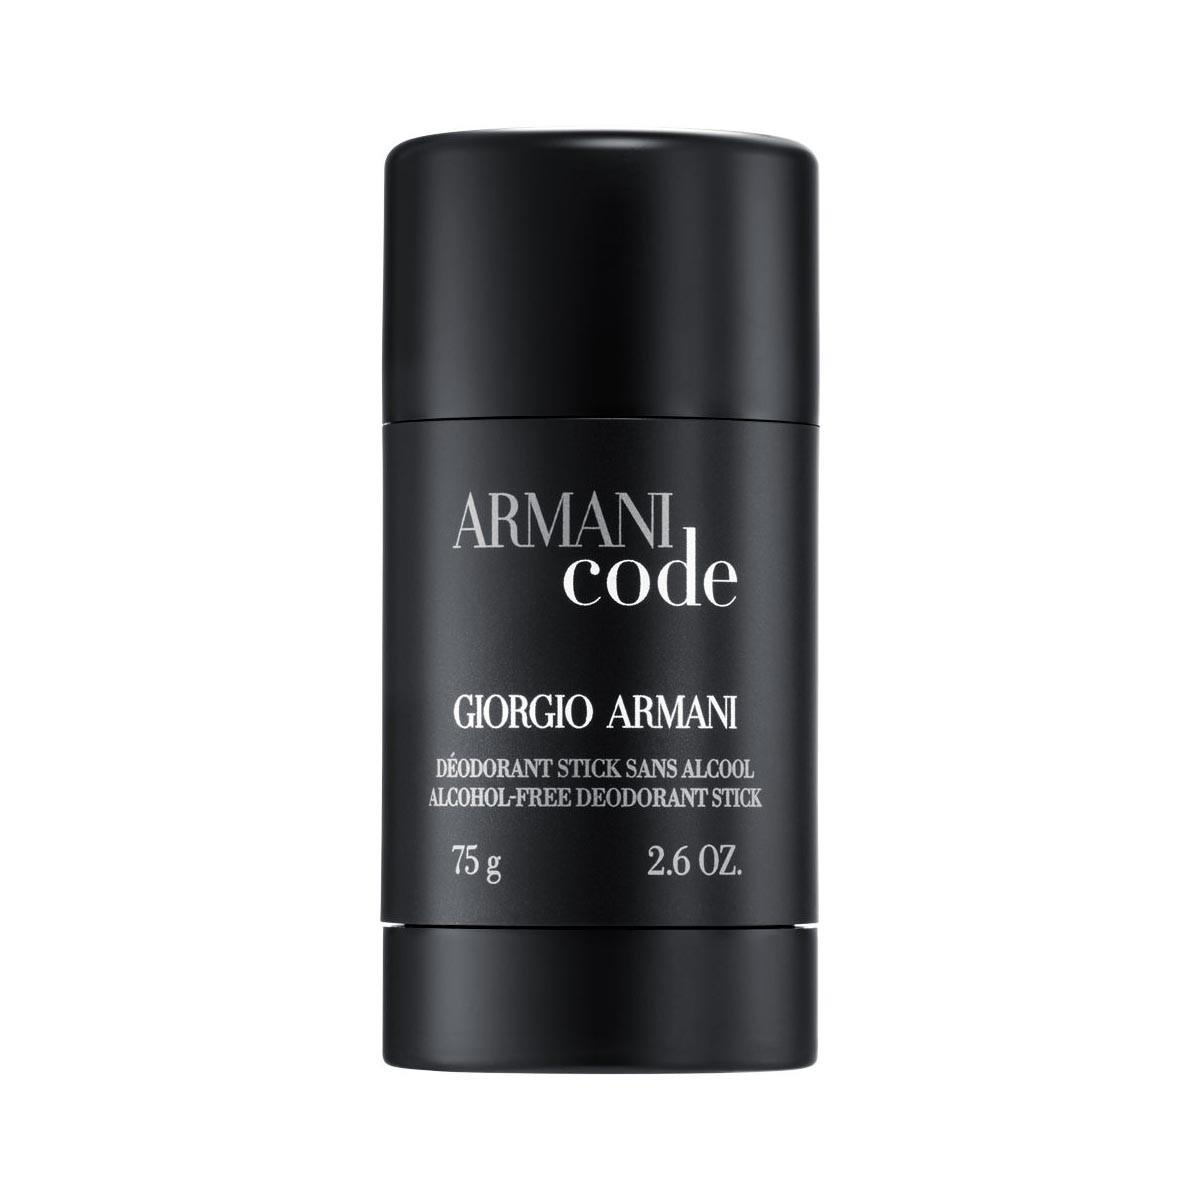 Giorgio Armani Black Code Deodorant Stick 75gr One Size